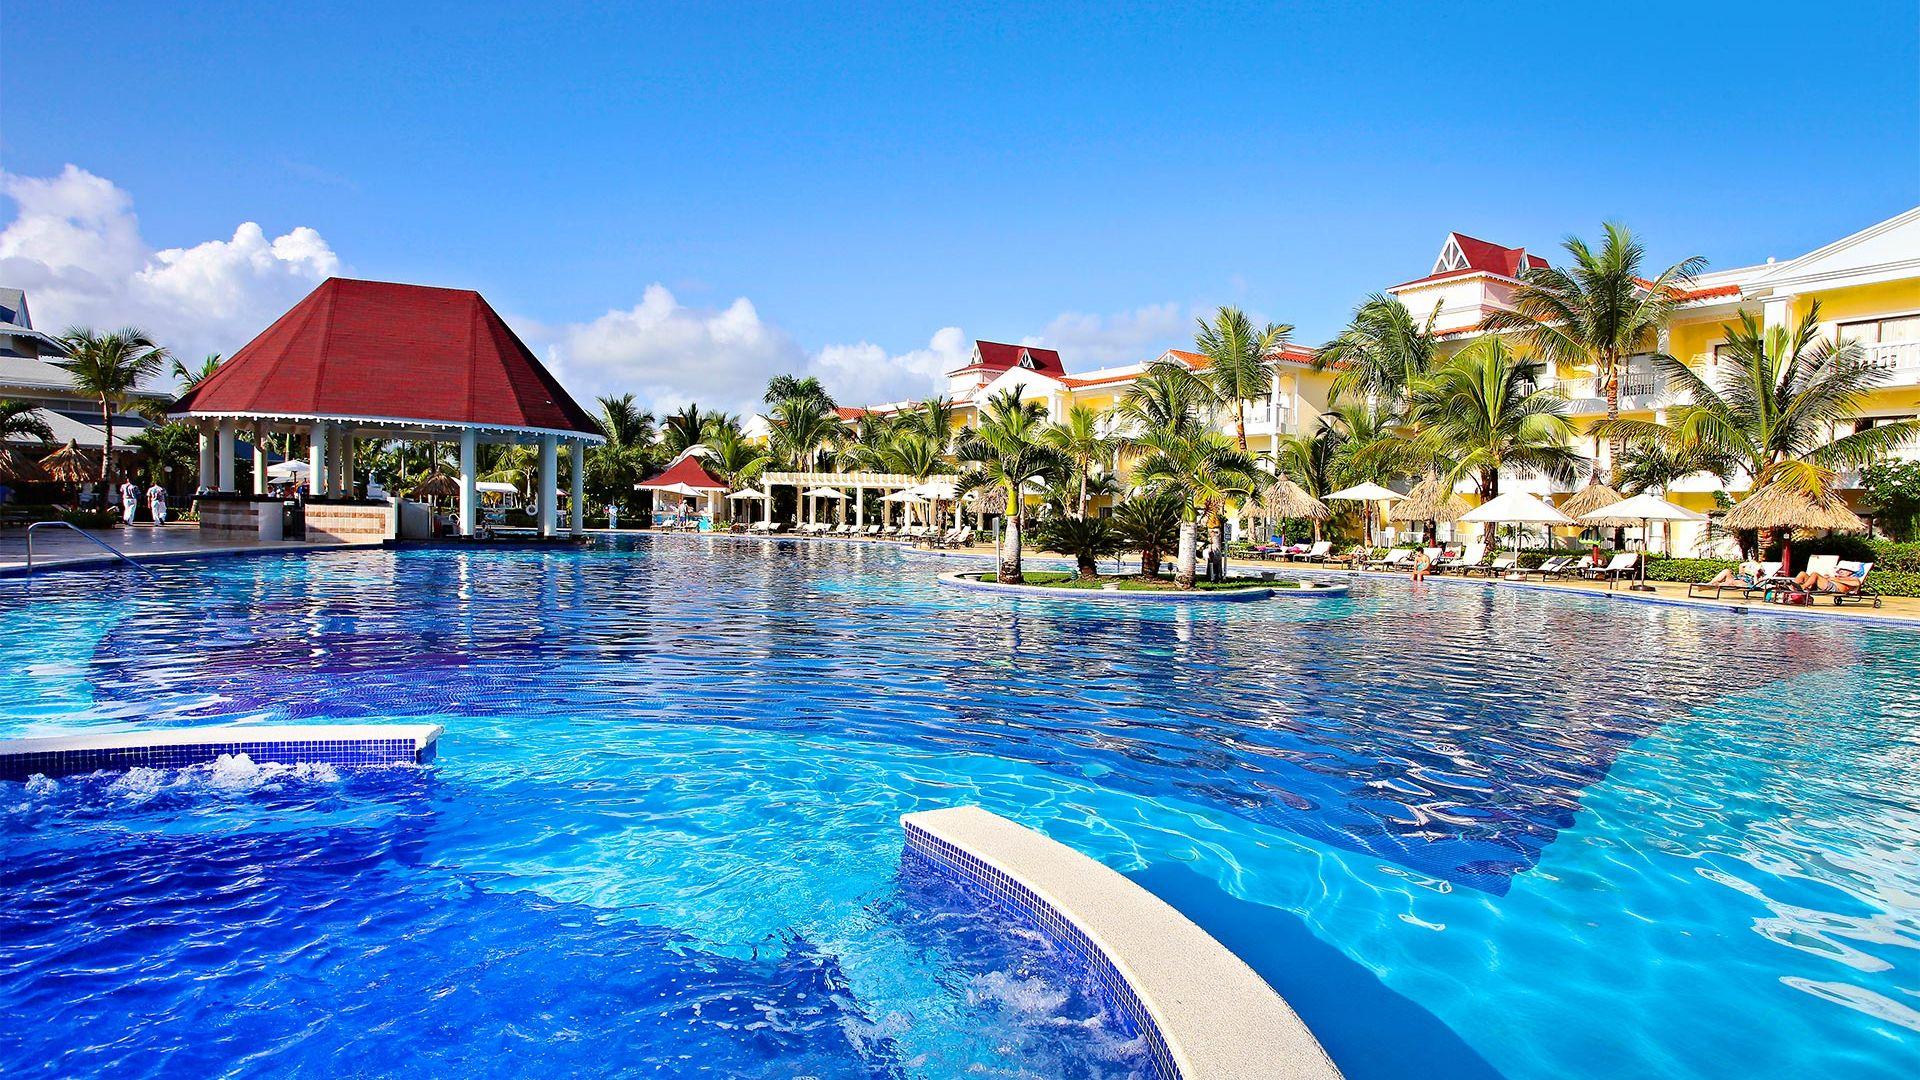 Revelion 2022 - Sejur charter Bahia Principe Resort Punta Cana, 9 zile